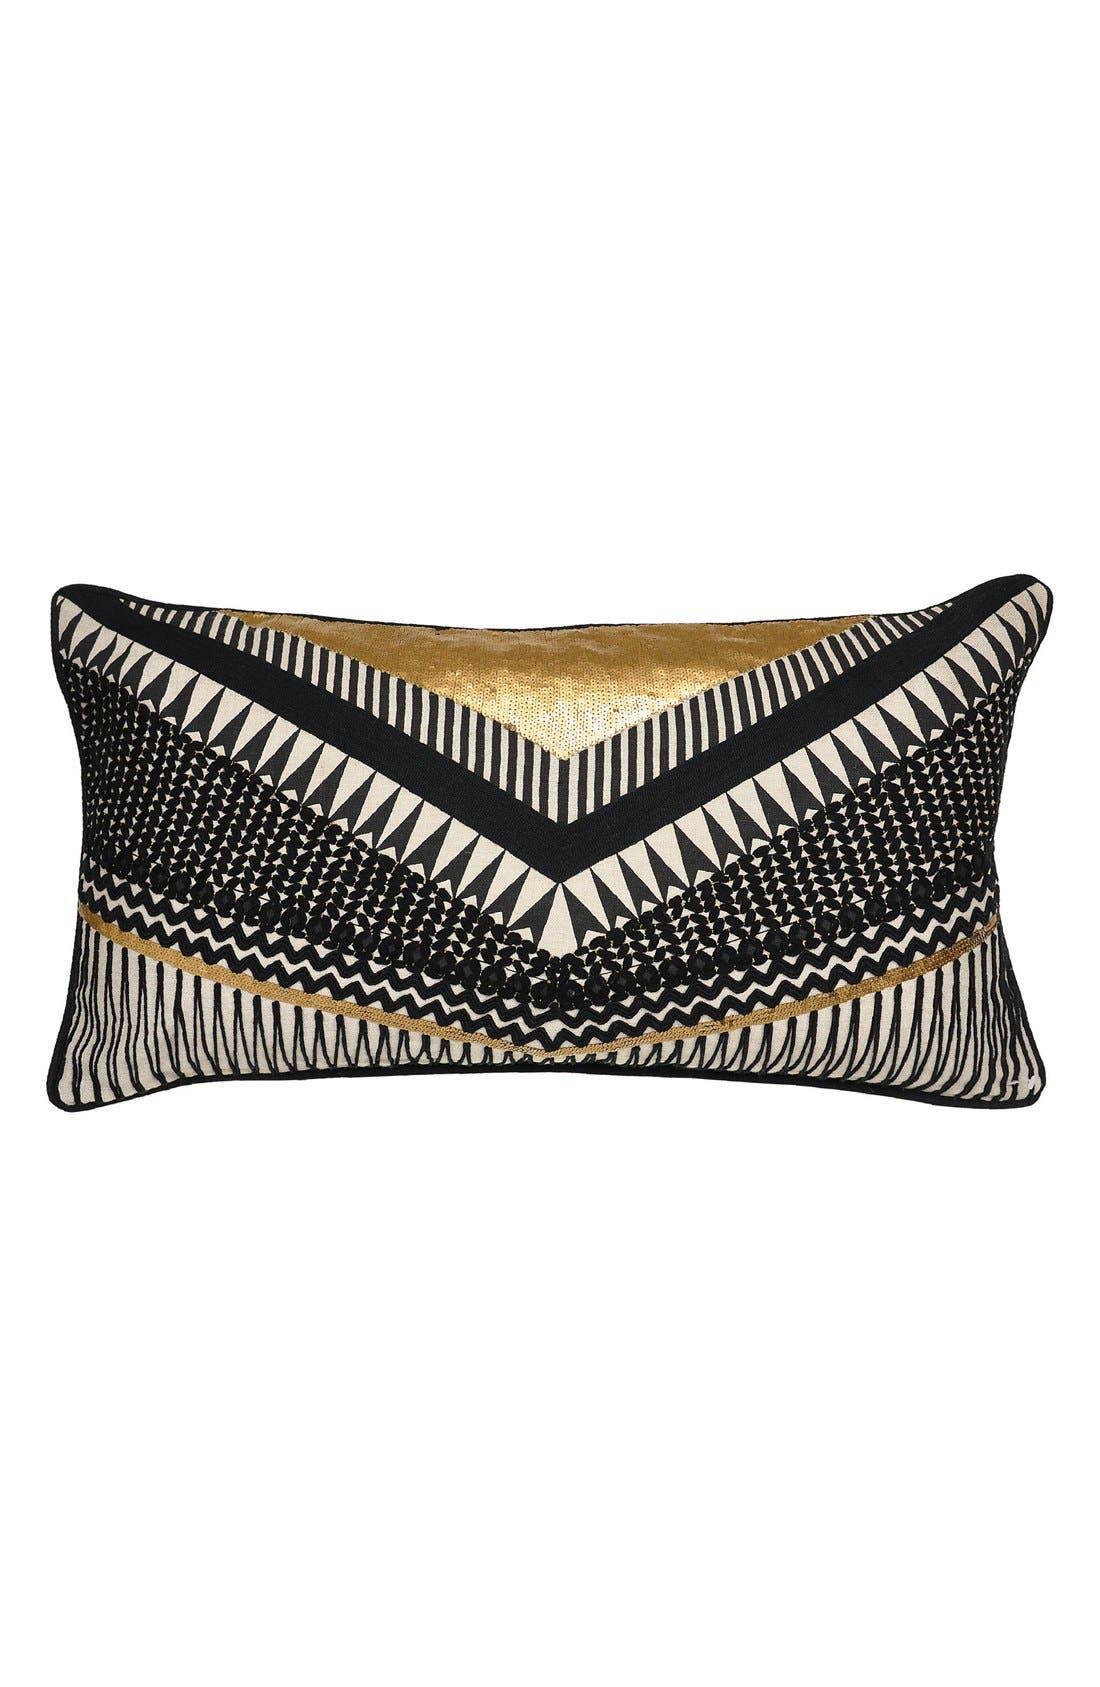 Main Image - Villa Home Collection 'Gatsby' Pillow